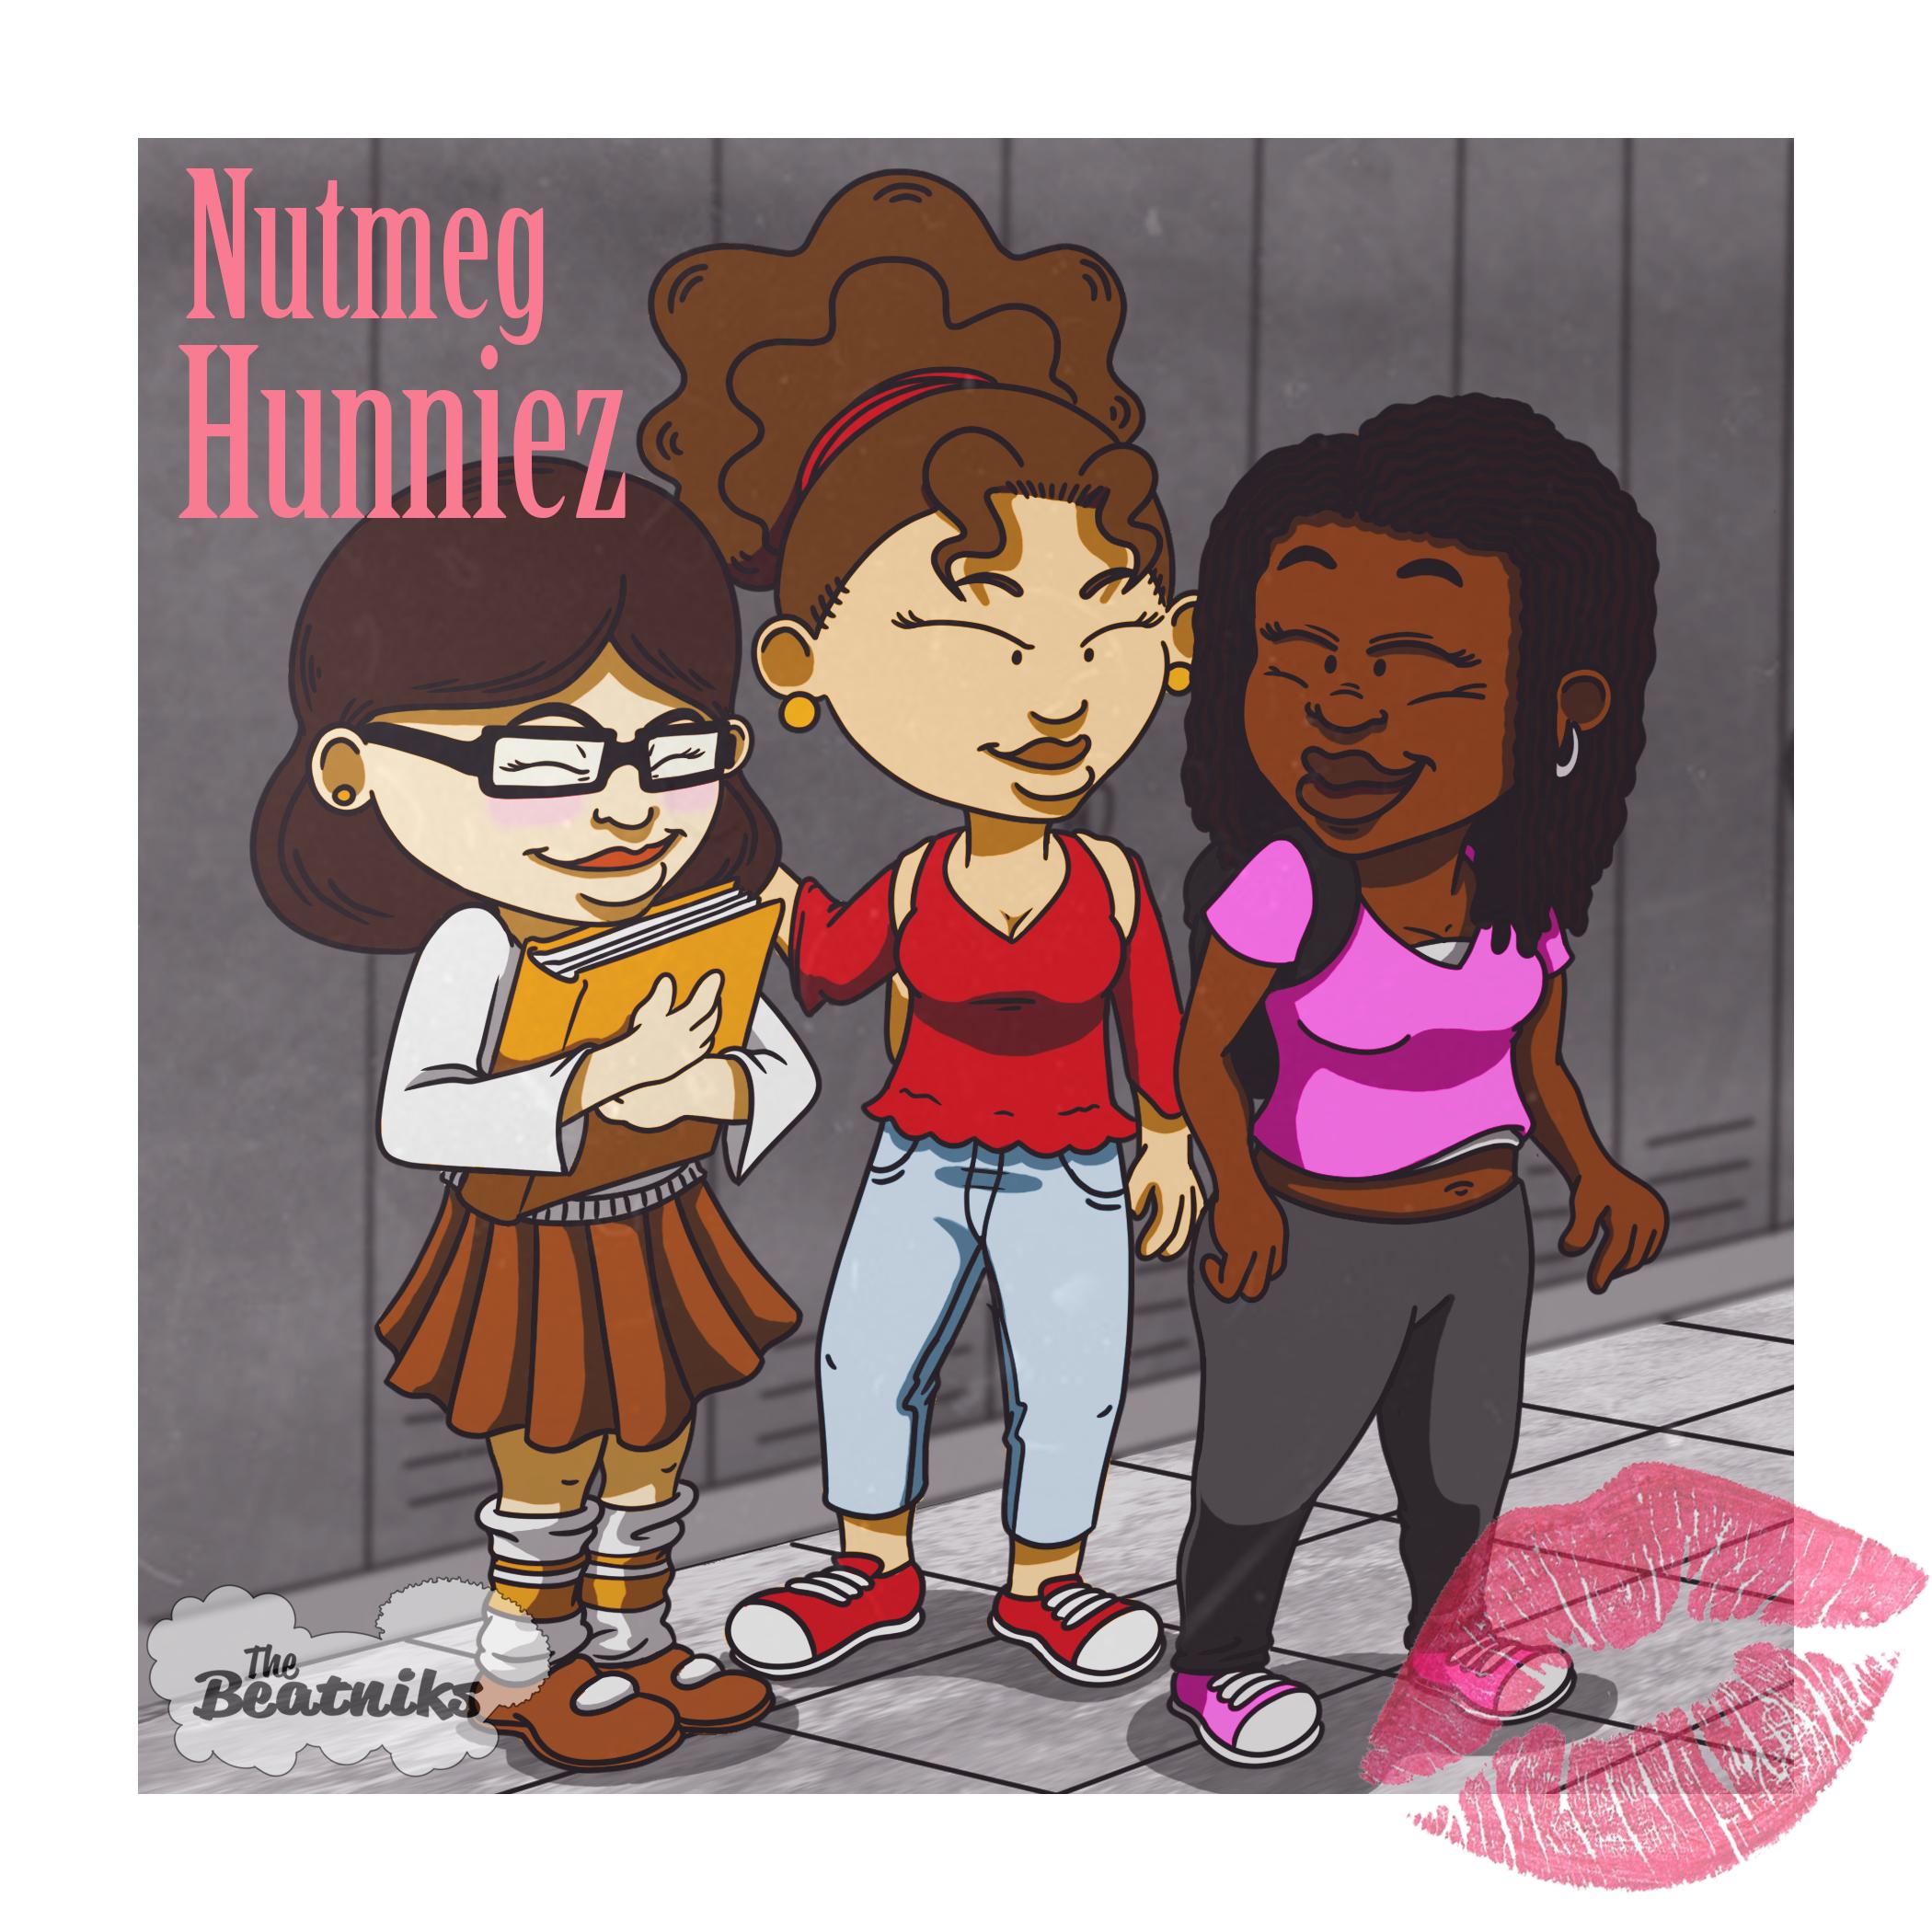 Nutmeg Hunniez